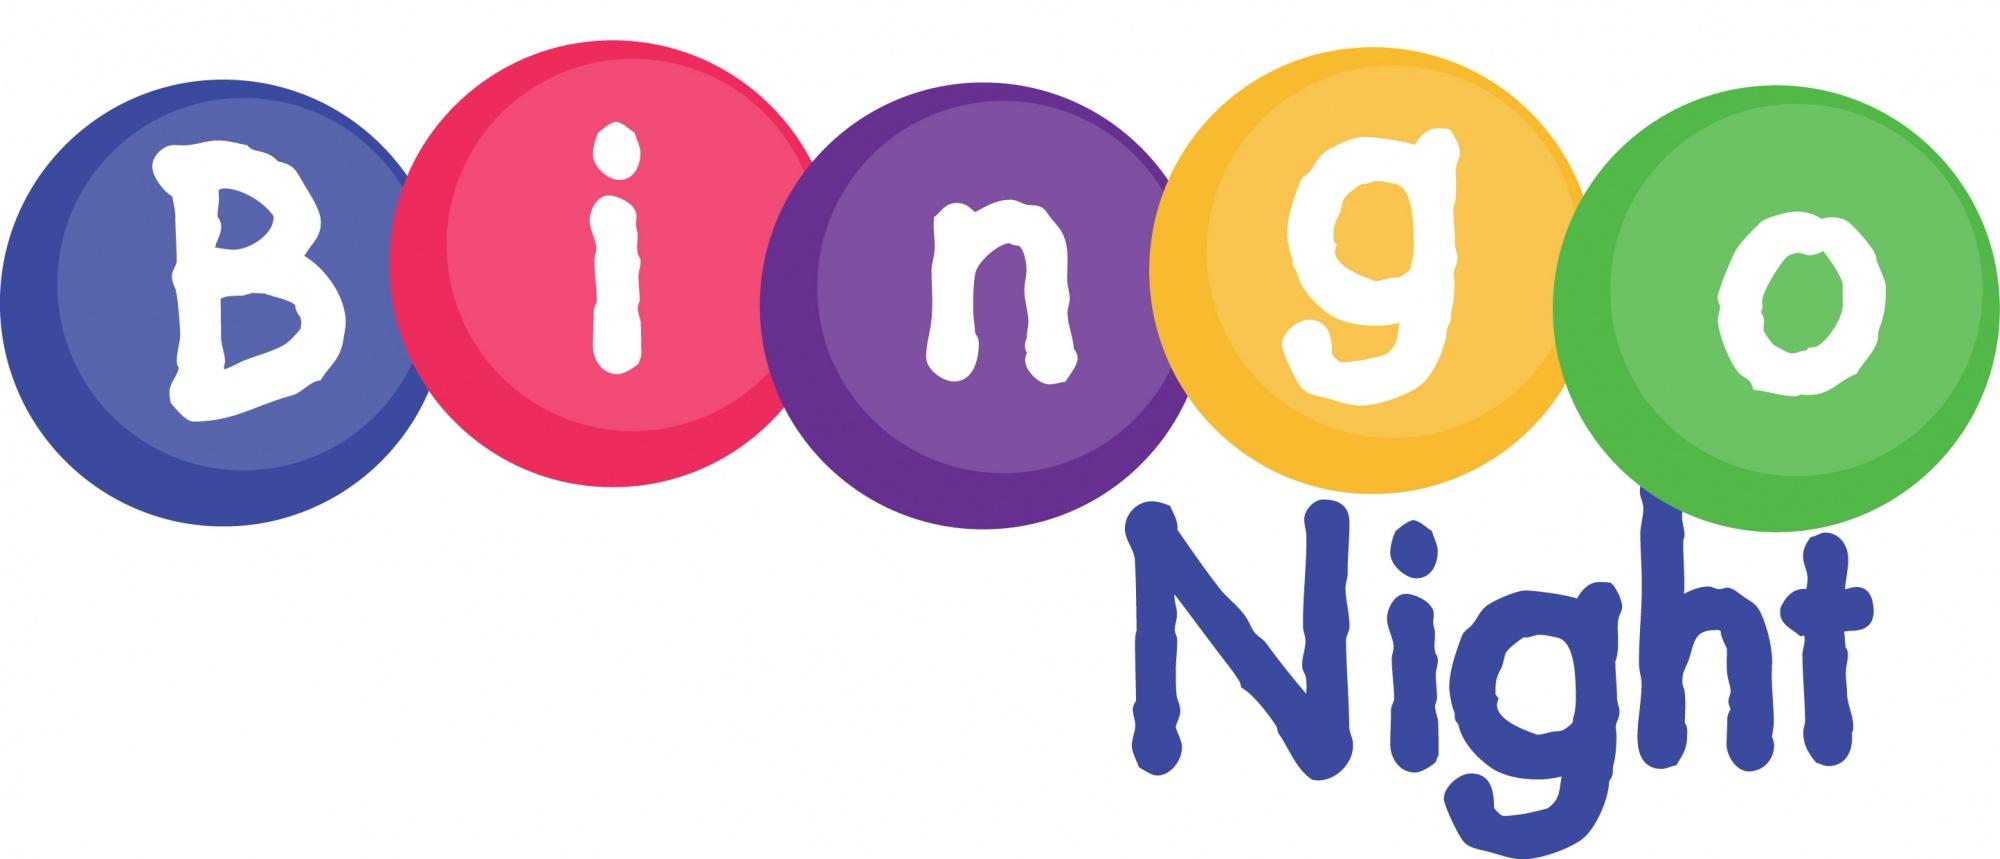 Family Fun Night Clip Art fun with our annual family bingo night which ...